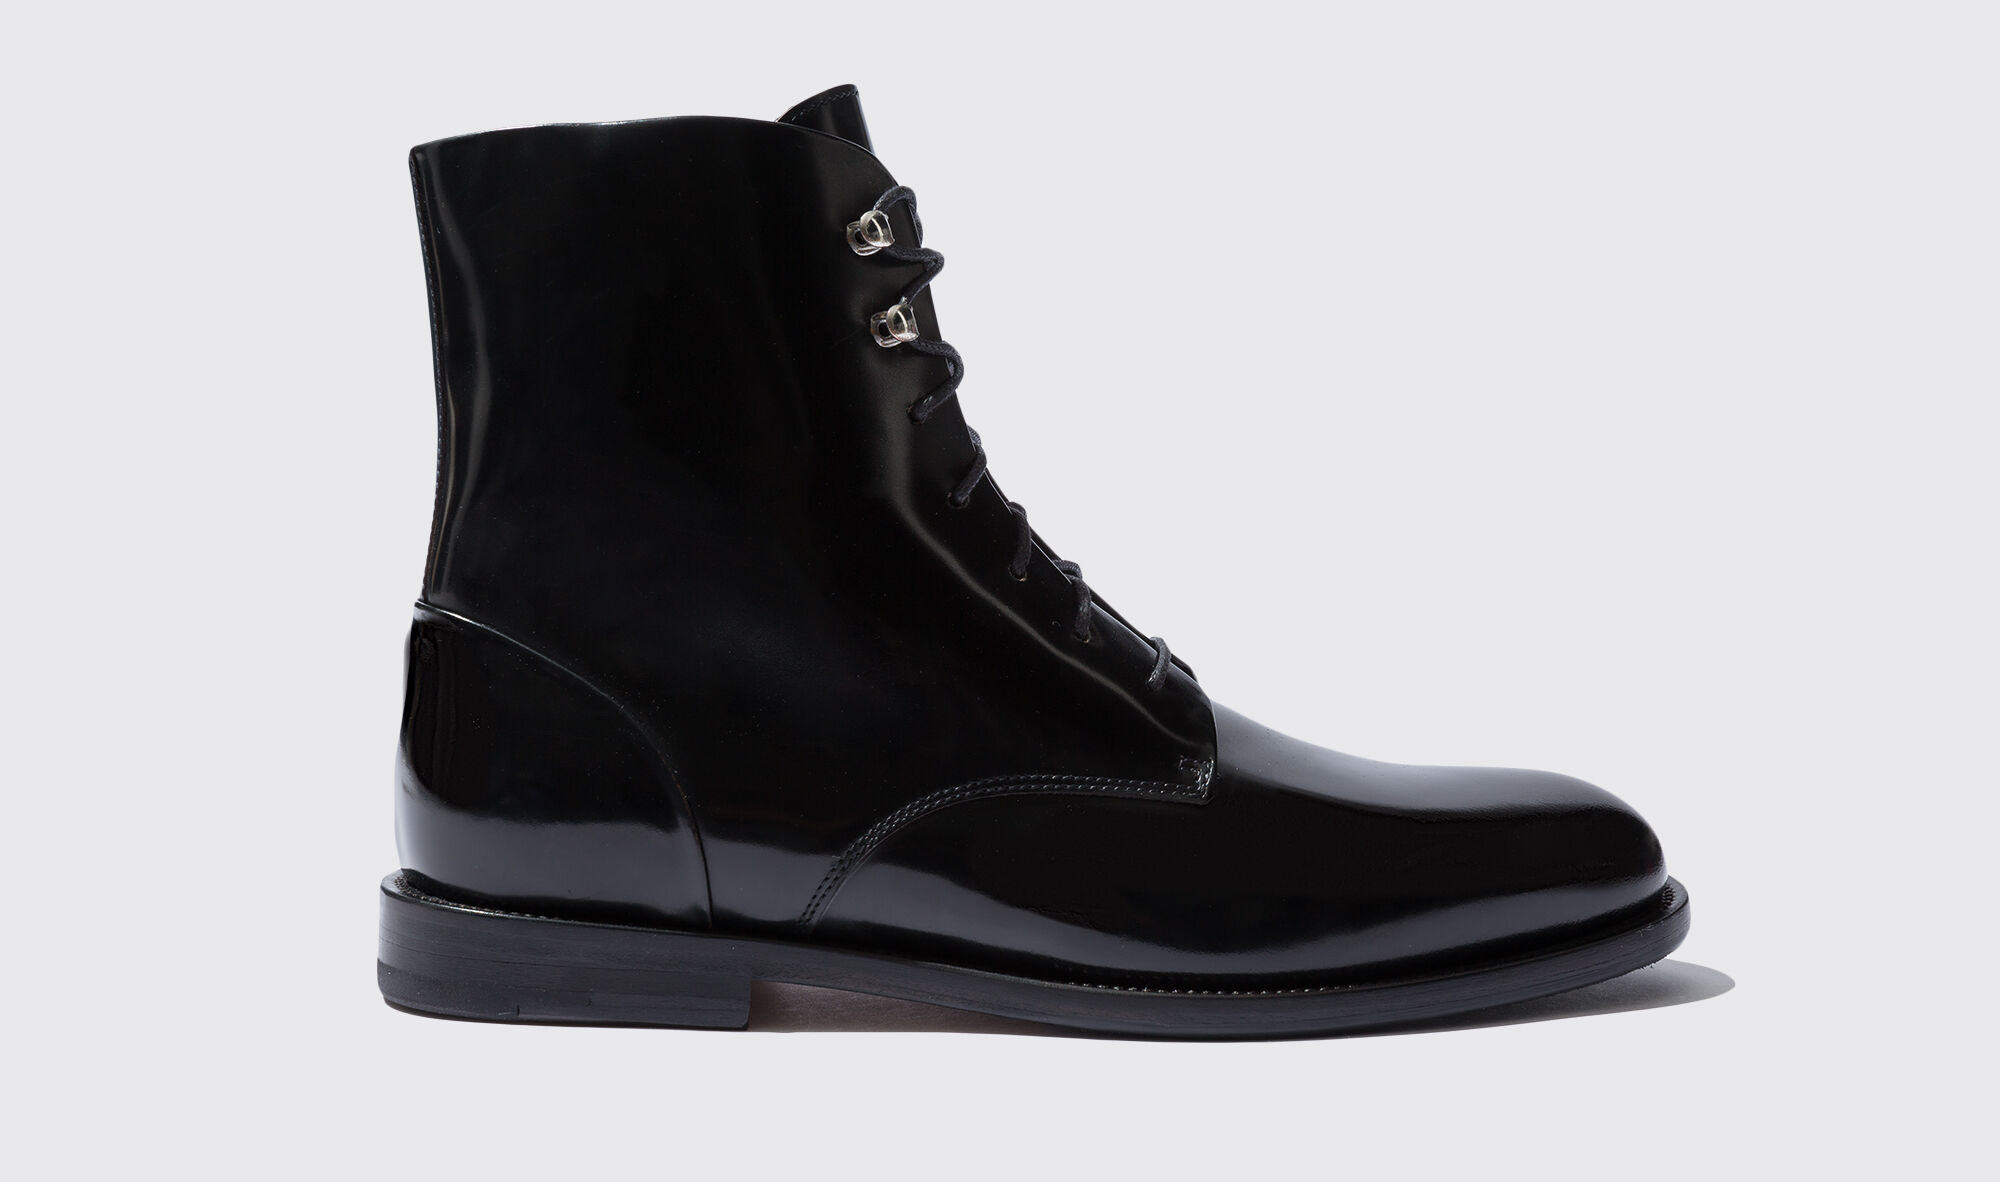 Scarosso Women's Black Nera Boots Eva Laced n7wHBaqf8